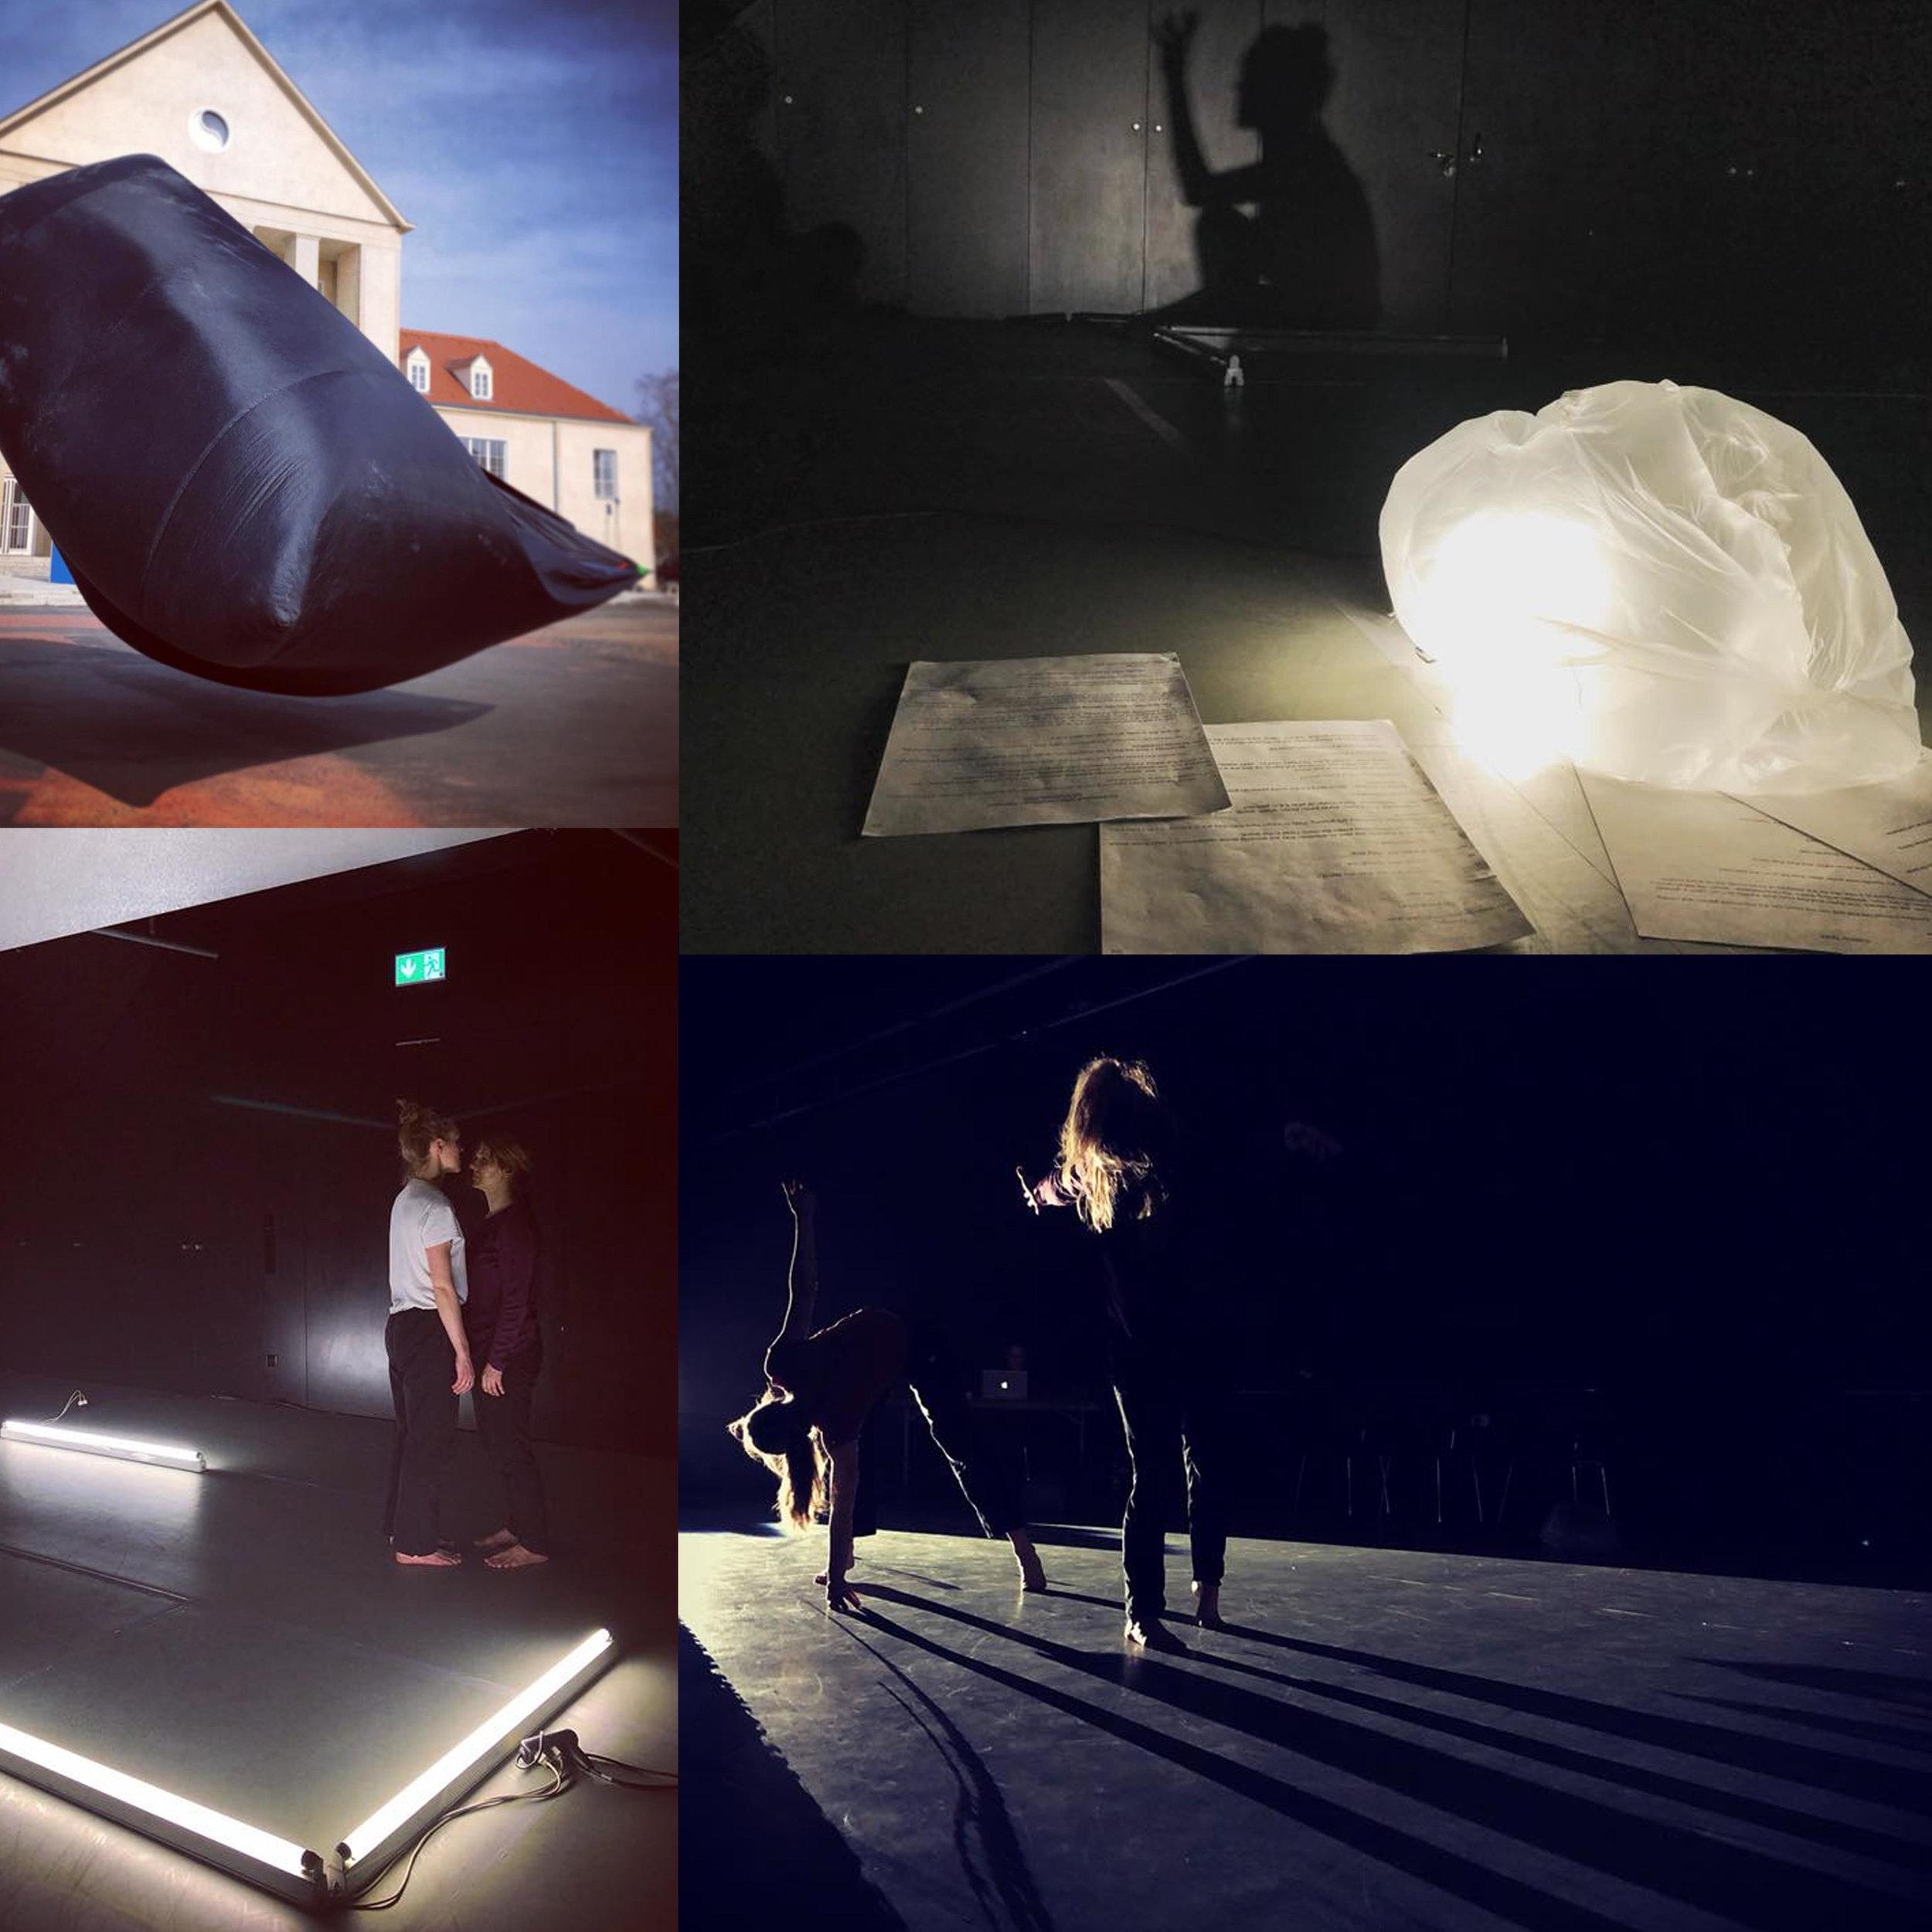 Susurrus in Hellerau-European Center for Contemporary Art, February 2018. Photos Kalle Ropponen.